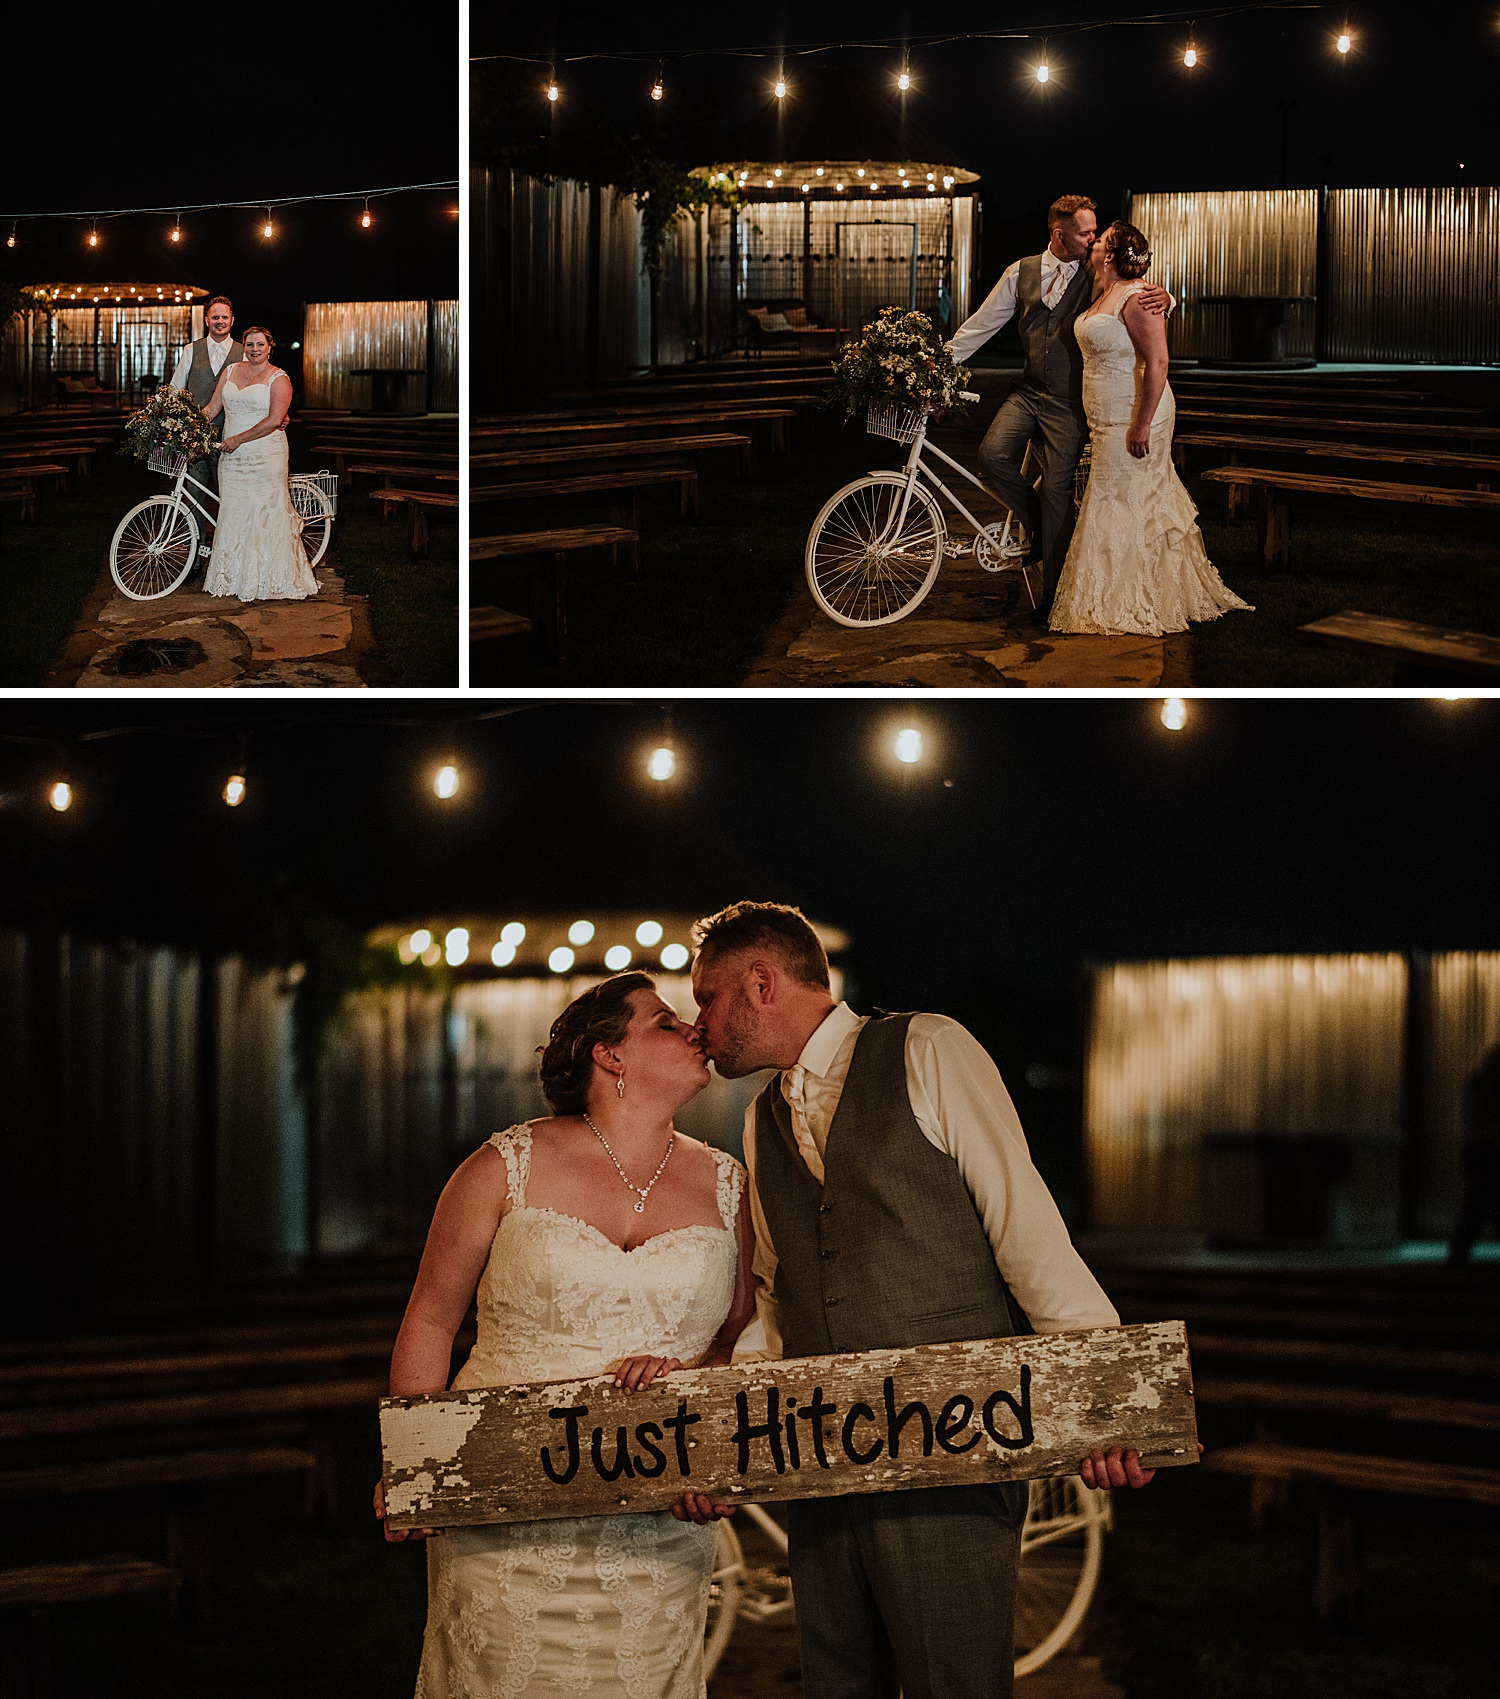 Terrace-167-Documentary-Wedding-Photographer_0035.jpg